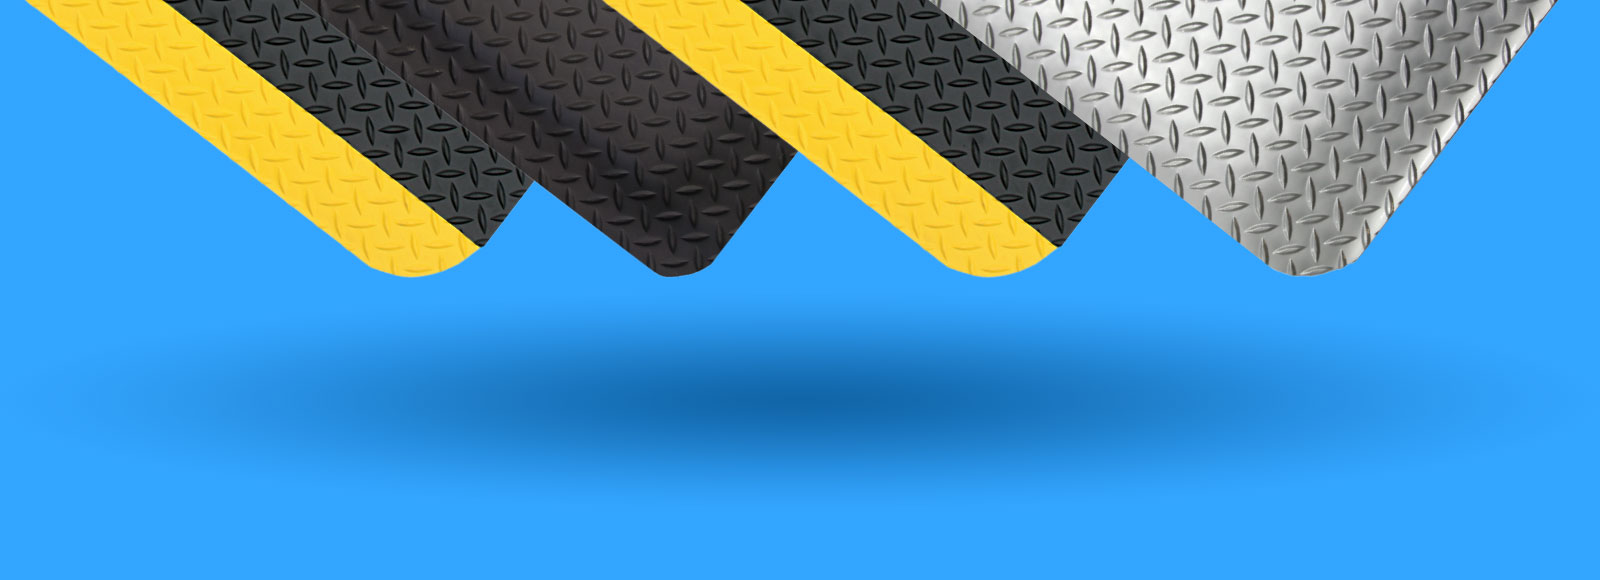 industrial rubber anti fatigue mats dock bumpers wheel chocks